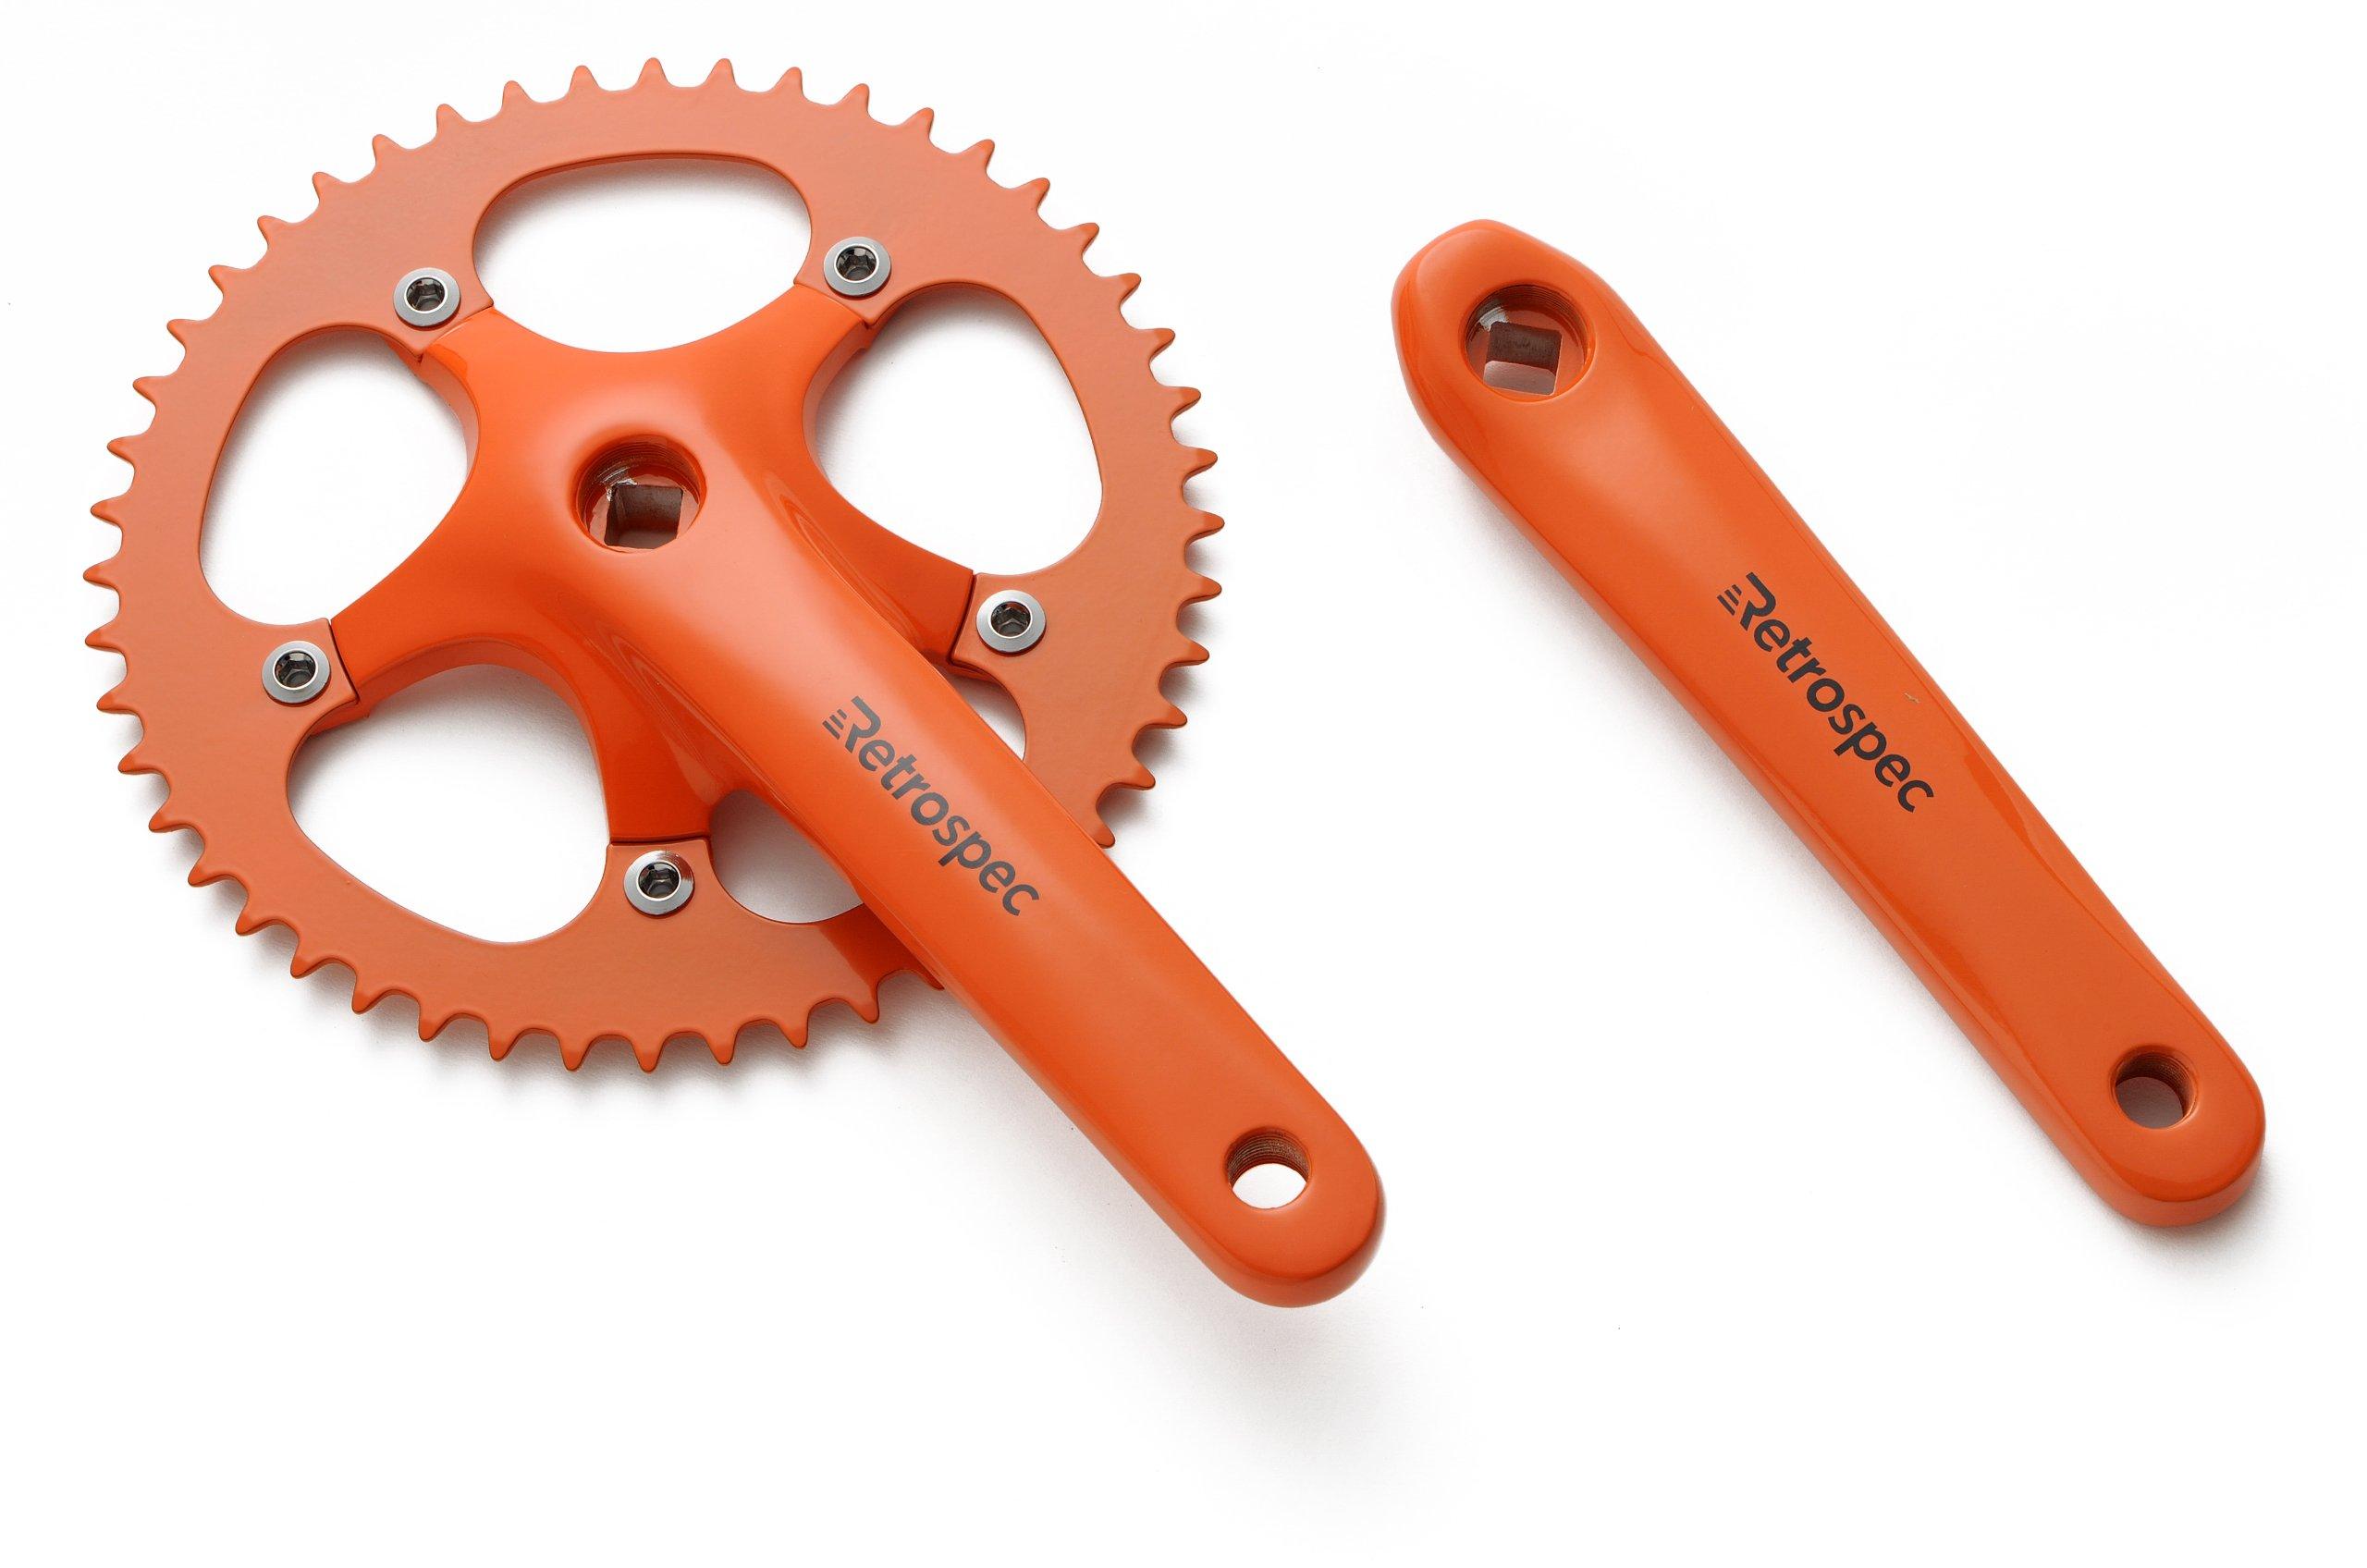 Retrospec Bicycles Fixed-Gear Crank Single-Speed Road Bicycle Forged Crankset, Orange, 44T by Retrospec